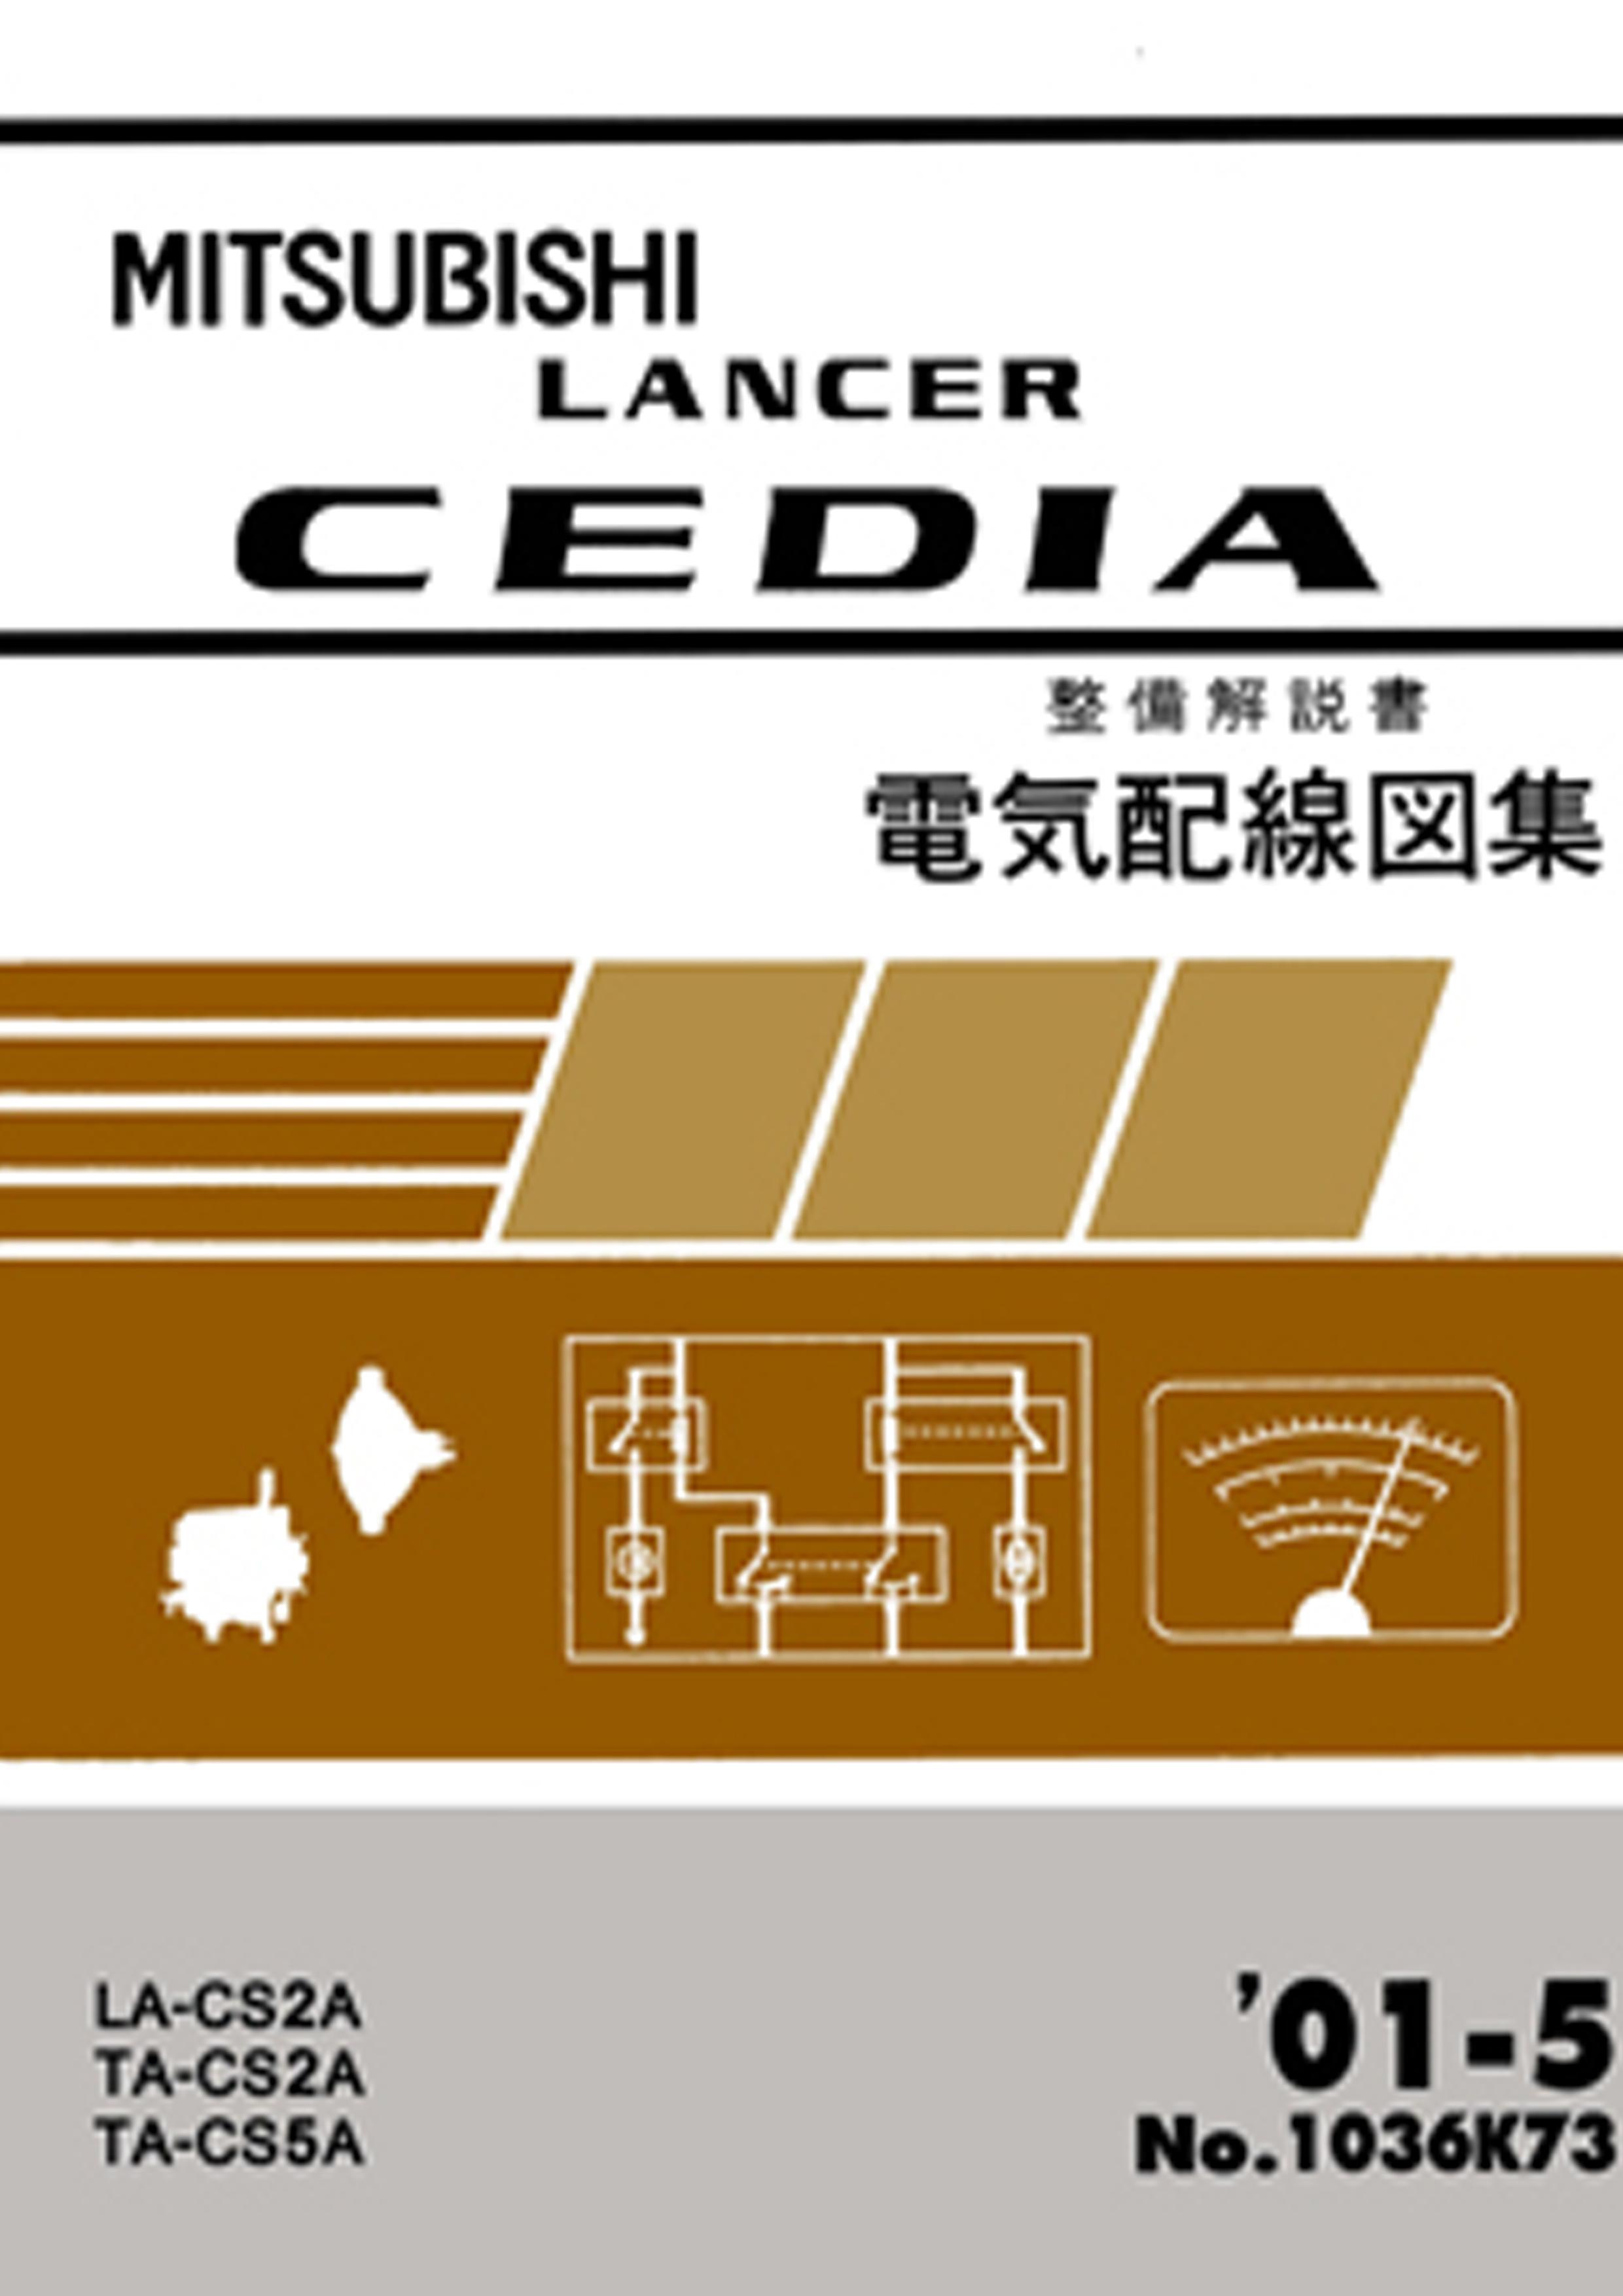 Wiring diagram 4g93 4k wiki wallpapers 2018 wiring diagram mitsubishi lancer cedia cheapraybanclubmaster Gallery